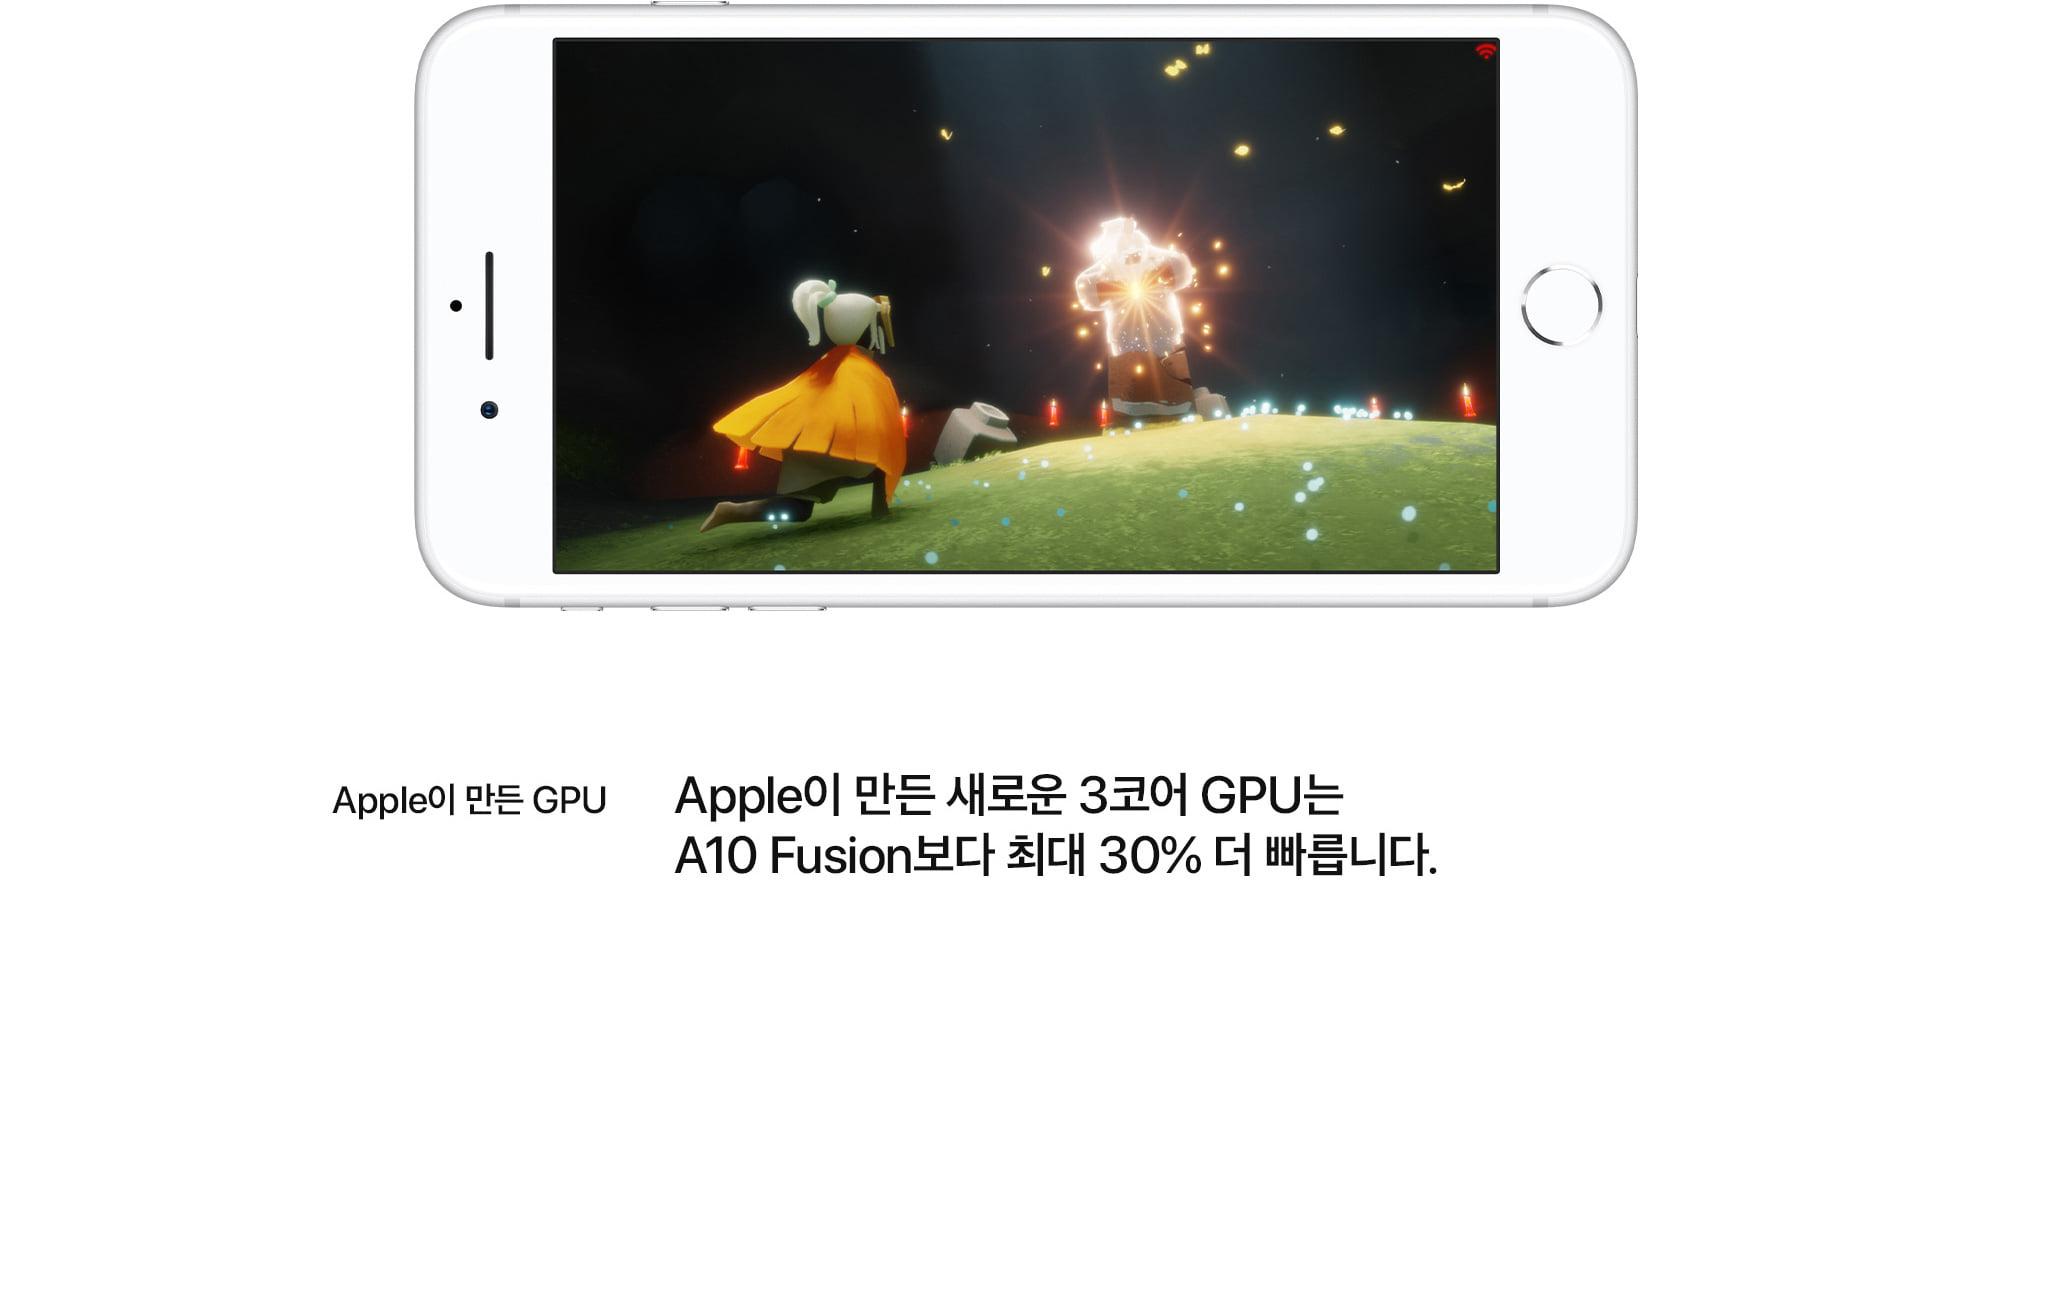 apple이 만든 gpu apple이 만든 새로운 3코어 gpu는 a10 fusion보다 최대 30% 더 빠릅니다.